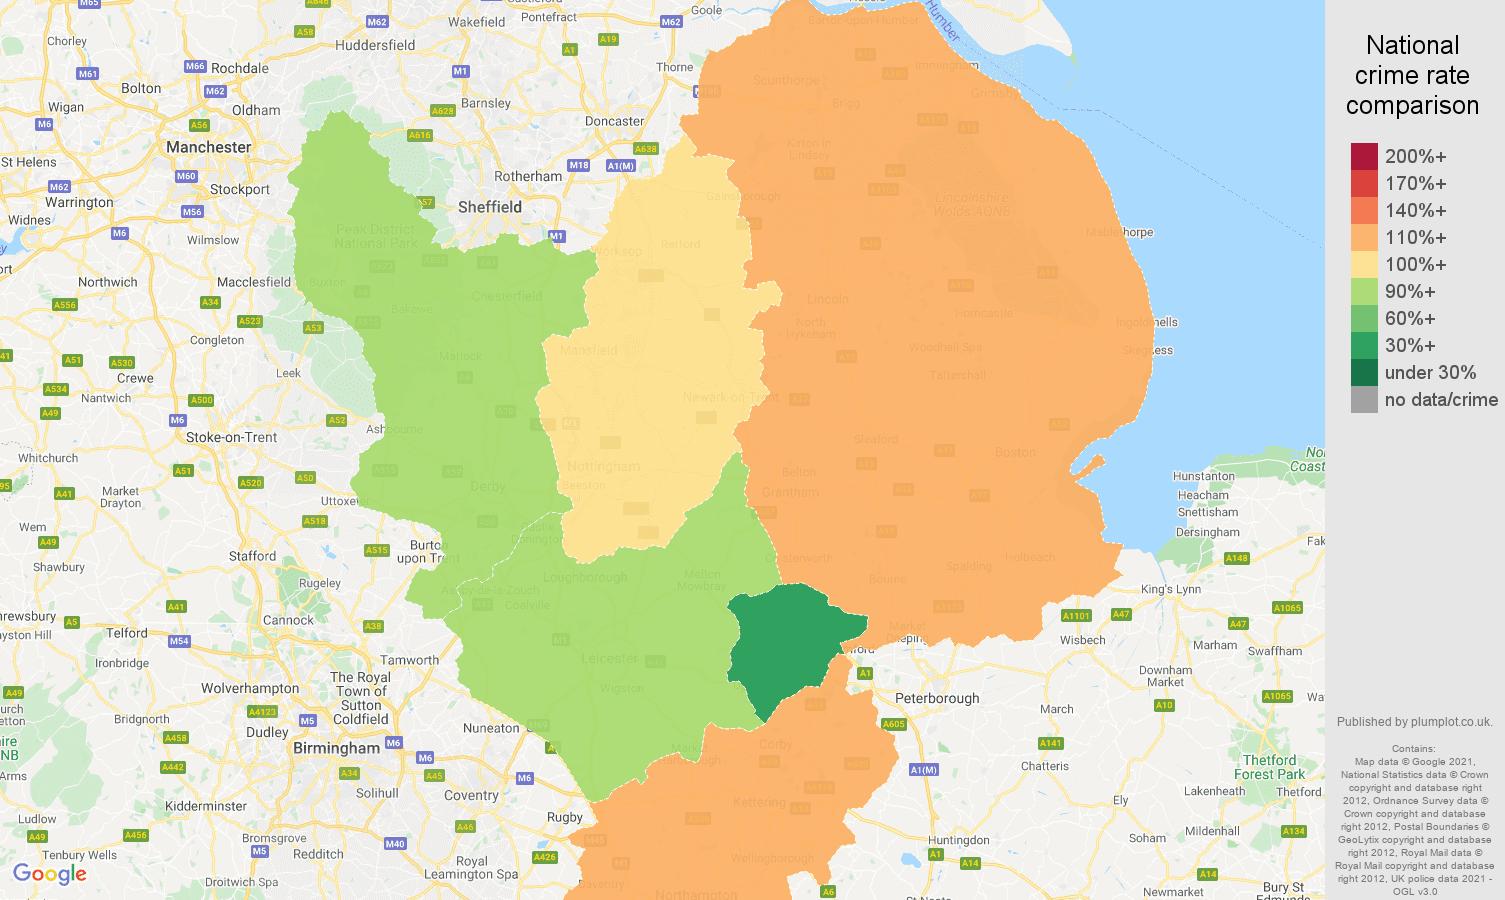 East Midlands burglary crime rate comparison map